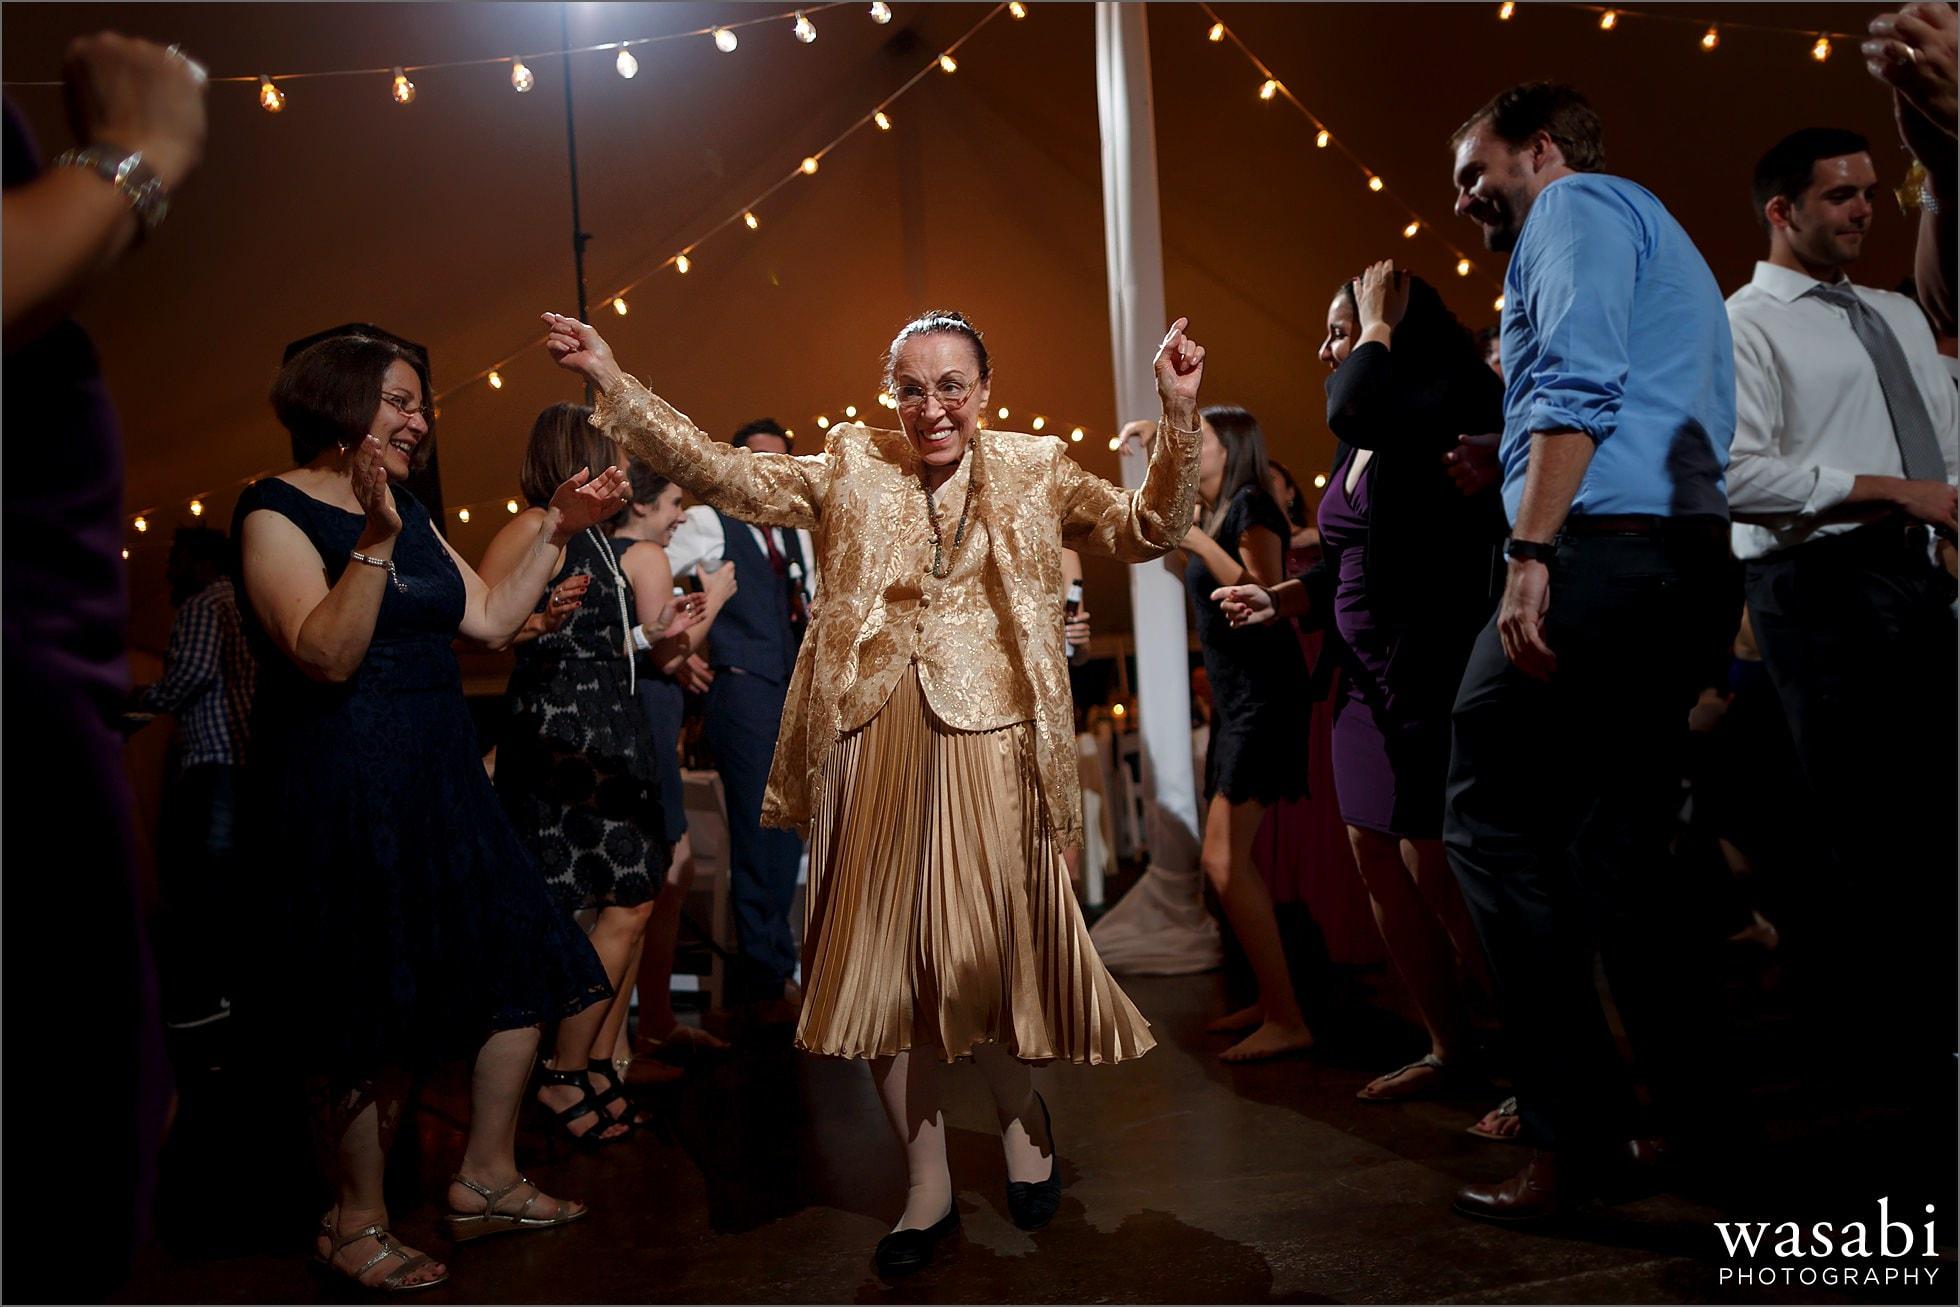 epic grandma dancing wedding photo